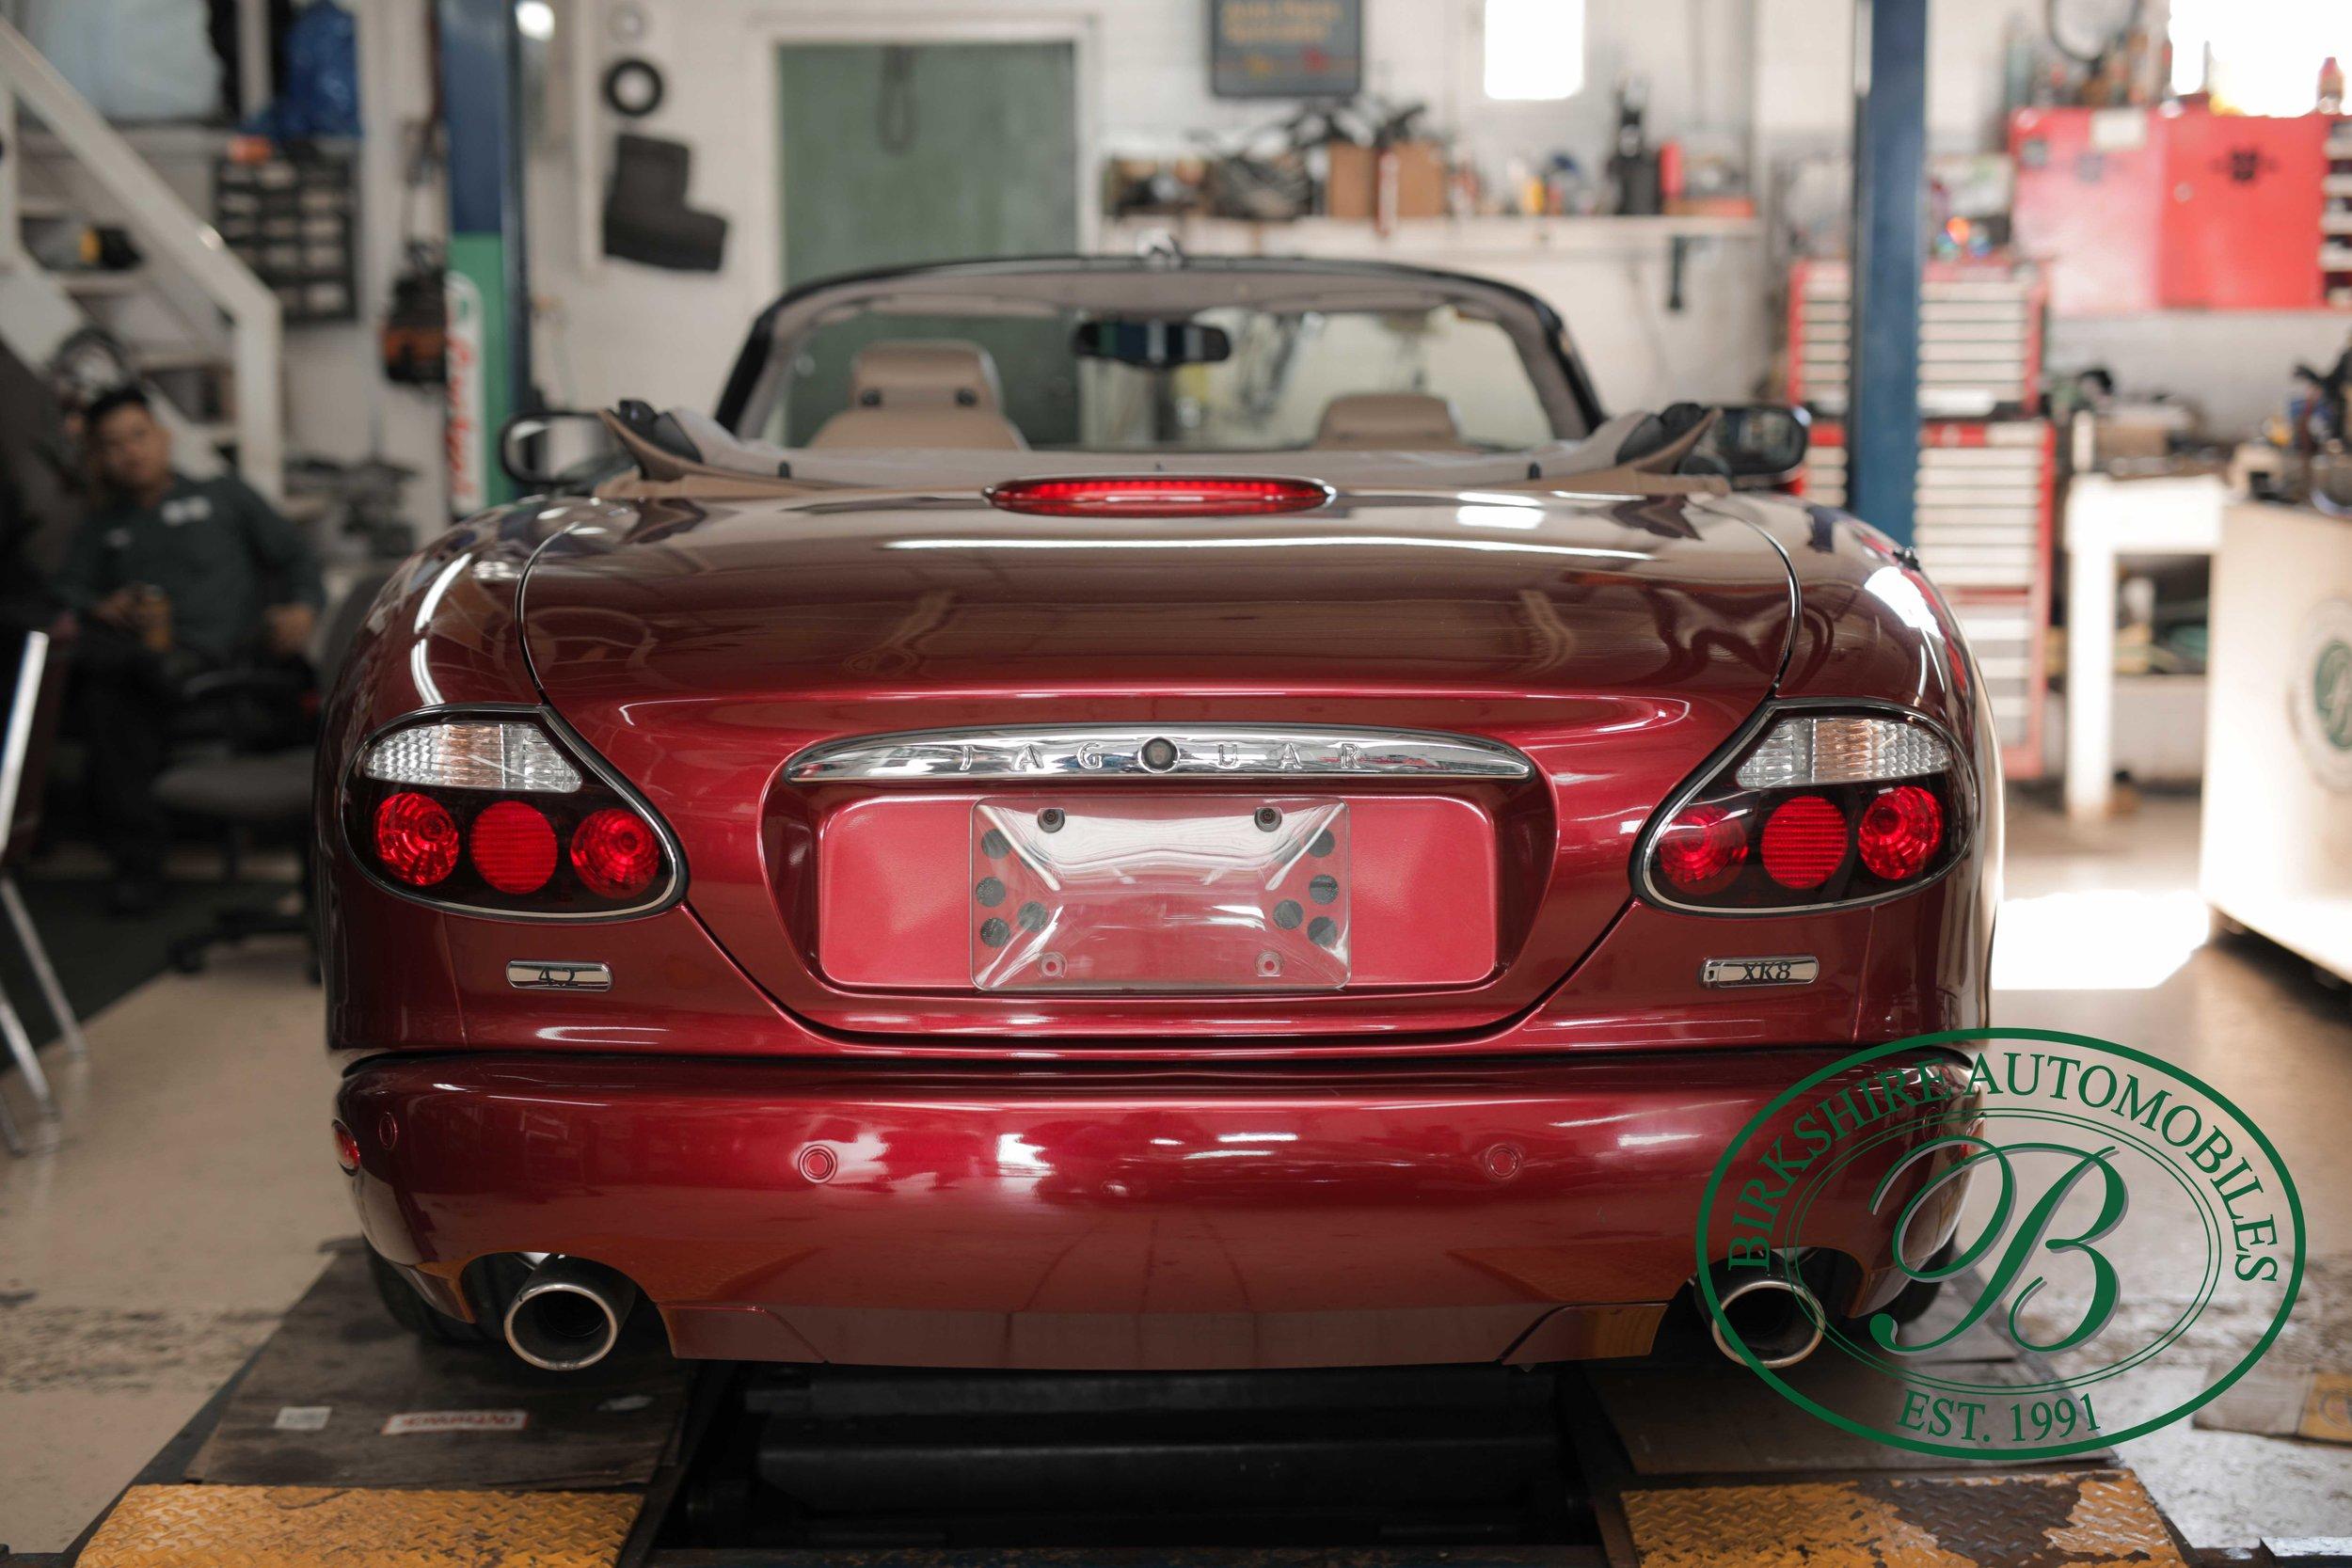 Birkshire Automobiles Britsh Car Service 2008 Jaguar XK8 Convertible-7.jpg